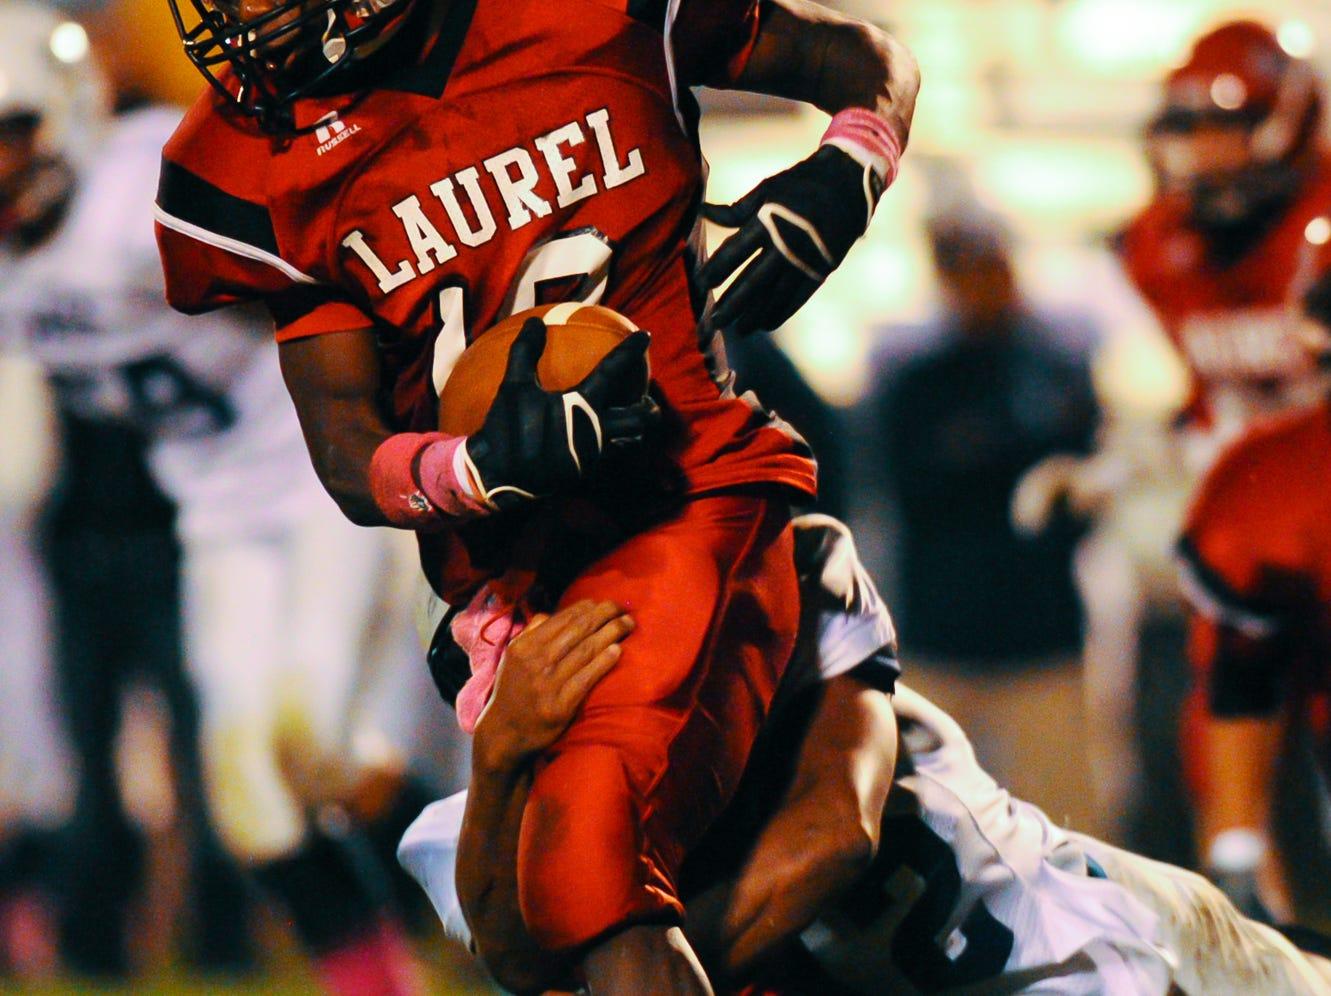 Laurel wide receiver Jarrett Johnson had 1,803 all-purpose yards last season including 1,043 receiving yards and seven touchdowns last season.